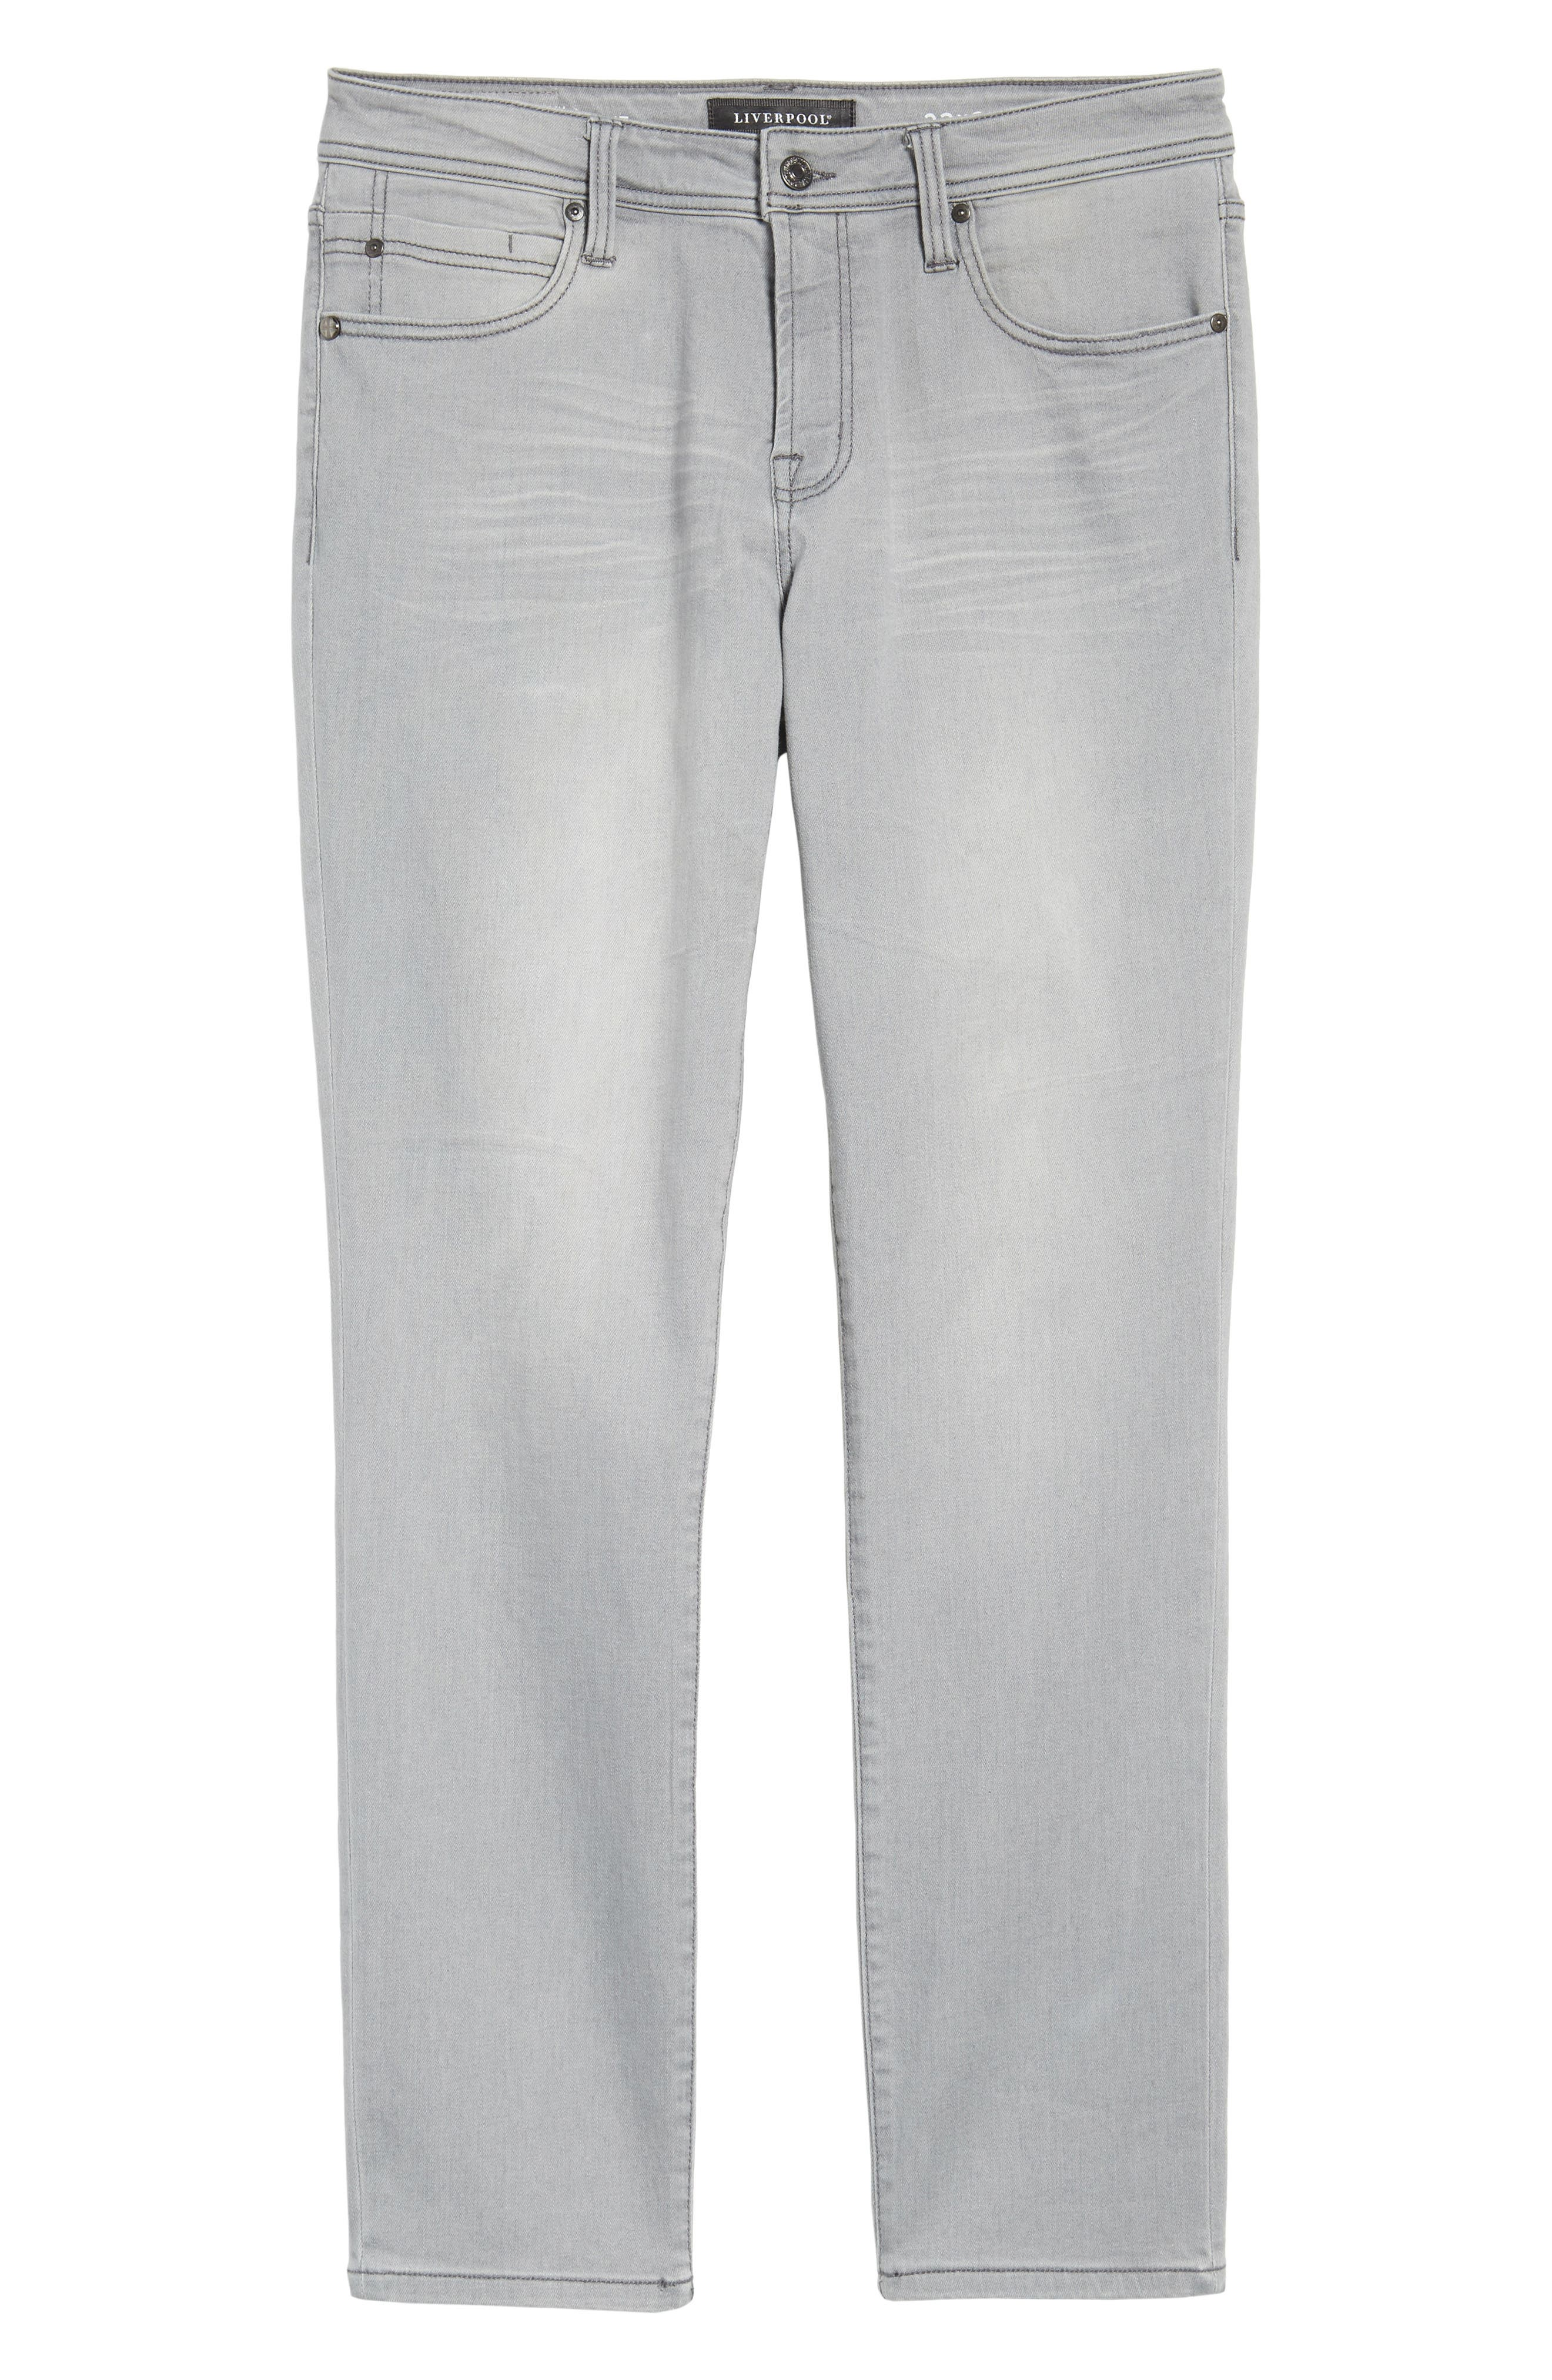 Jeans Co. Kingston Slim Straight Leg Jeans,                             Alternate thumbnail 6, color,                             COAL MINE DARK